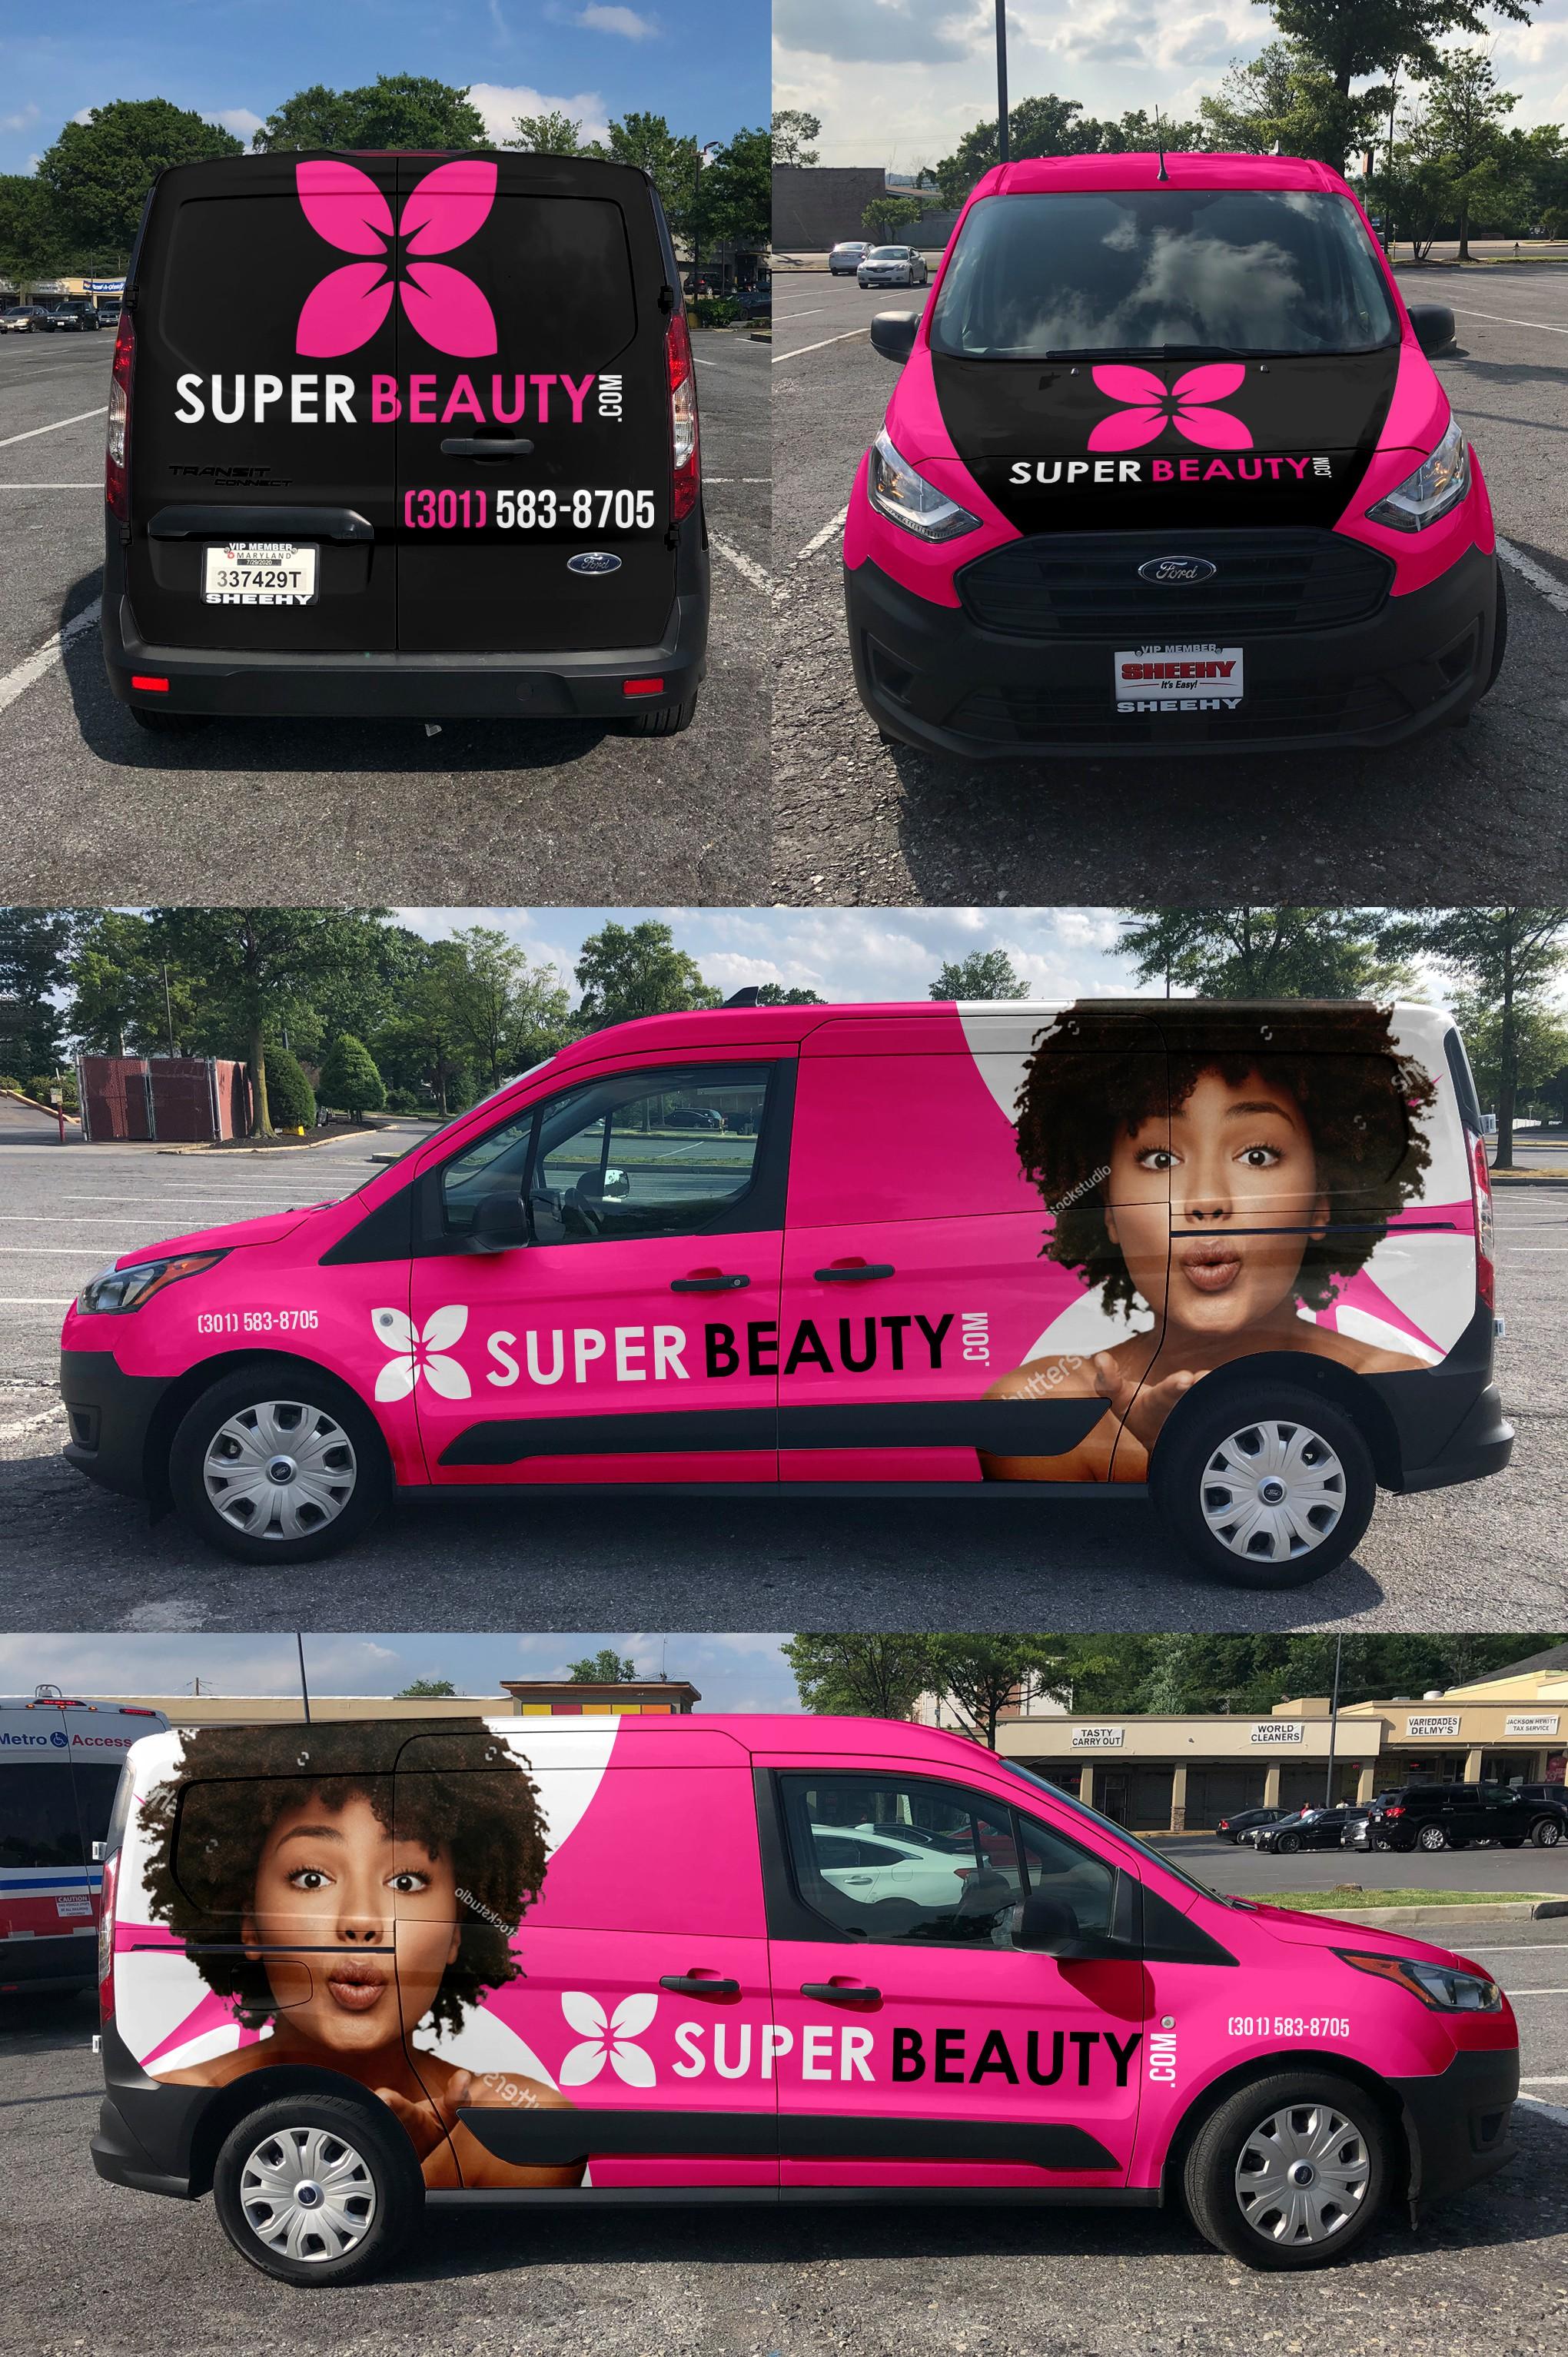 "Design a Super Beauty (Clean, modern look that ""POPS"") Van Wrap"